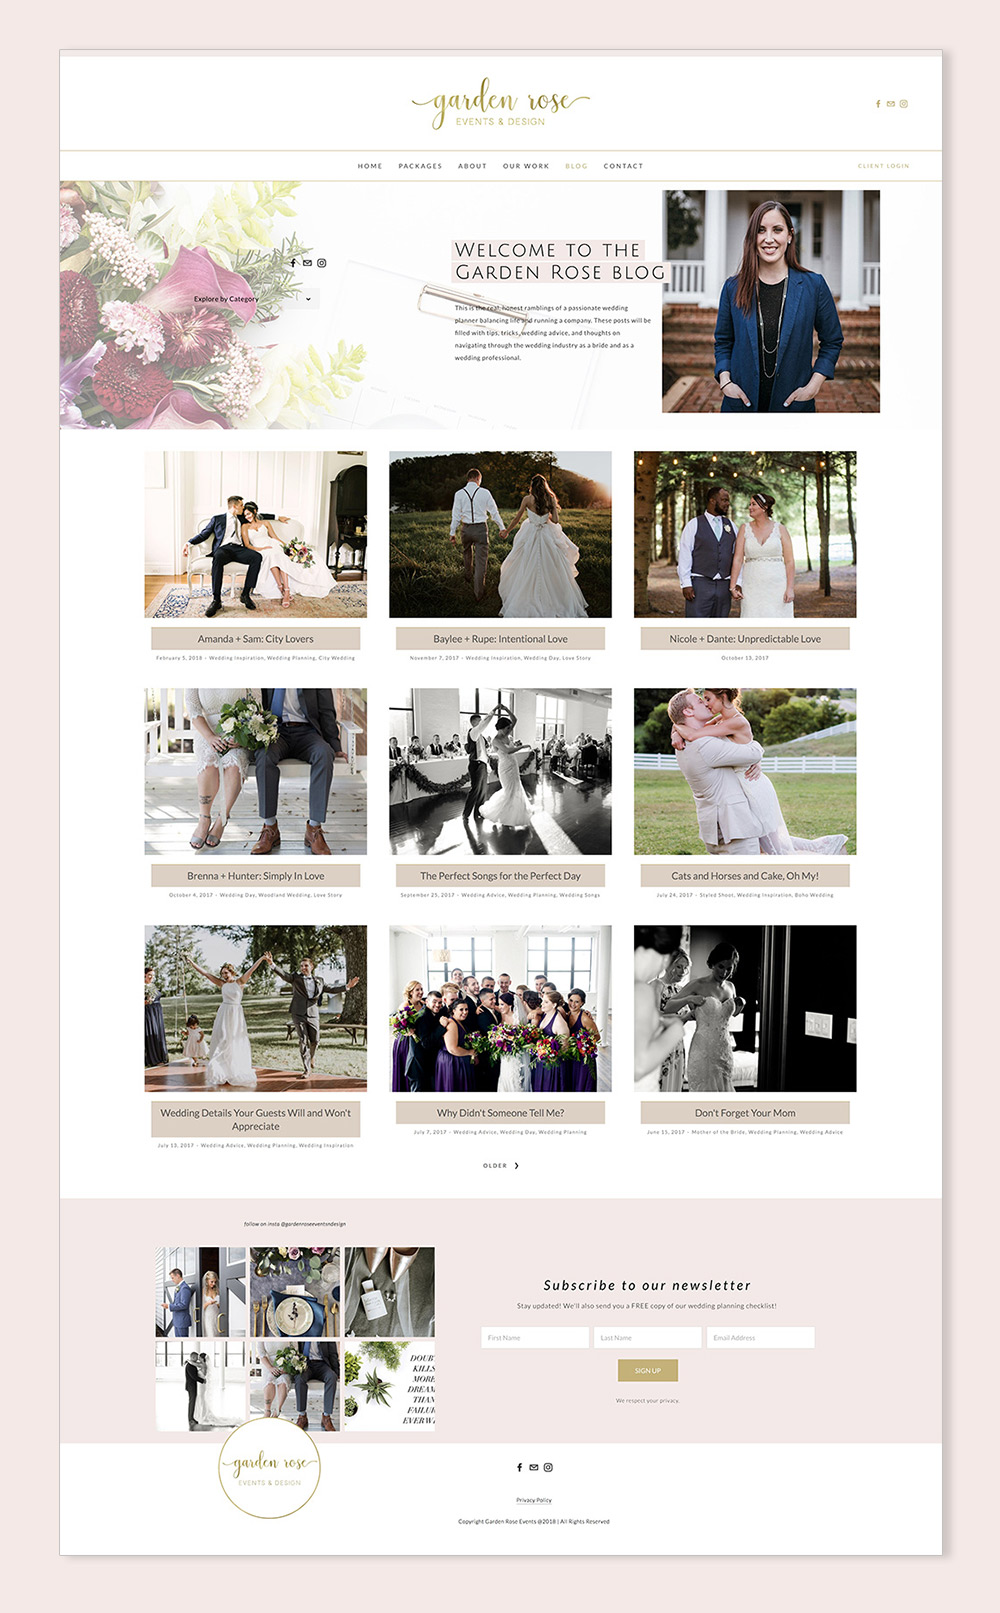 blog page for wedding planner | Garden Rose Events & Design | Squarespace web design by Jodi Neufeld Design